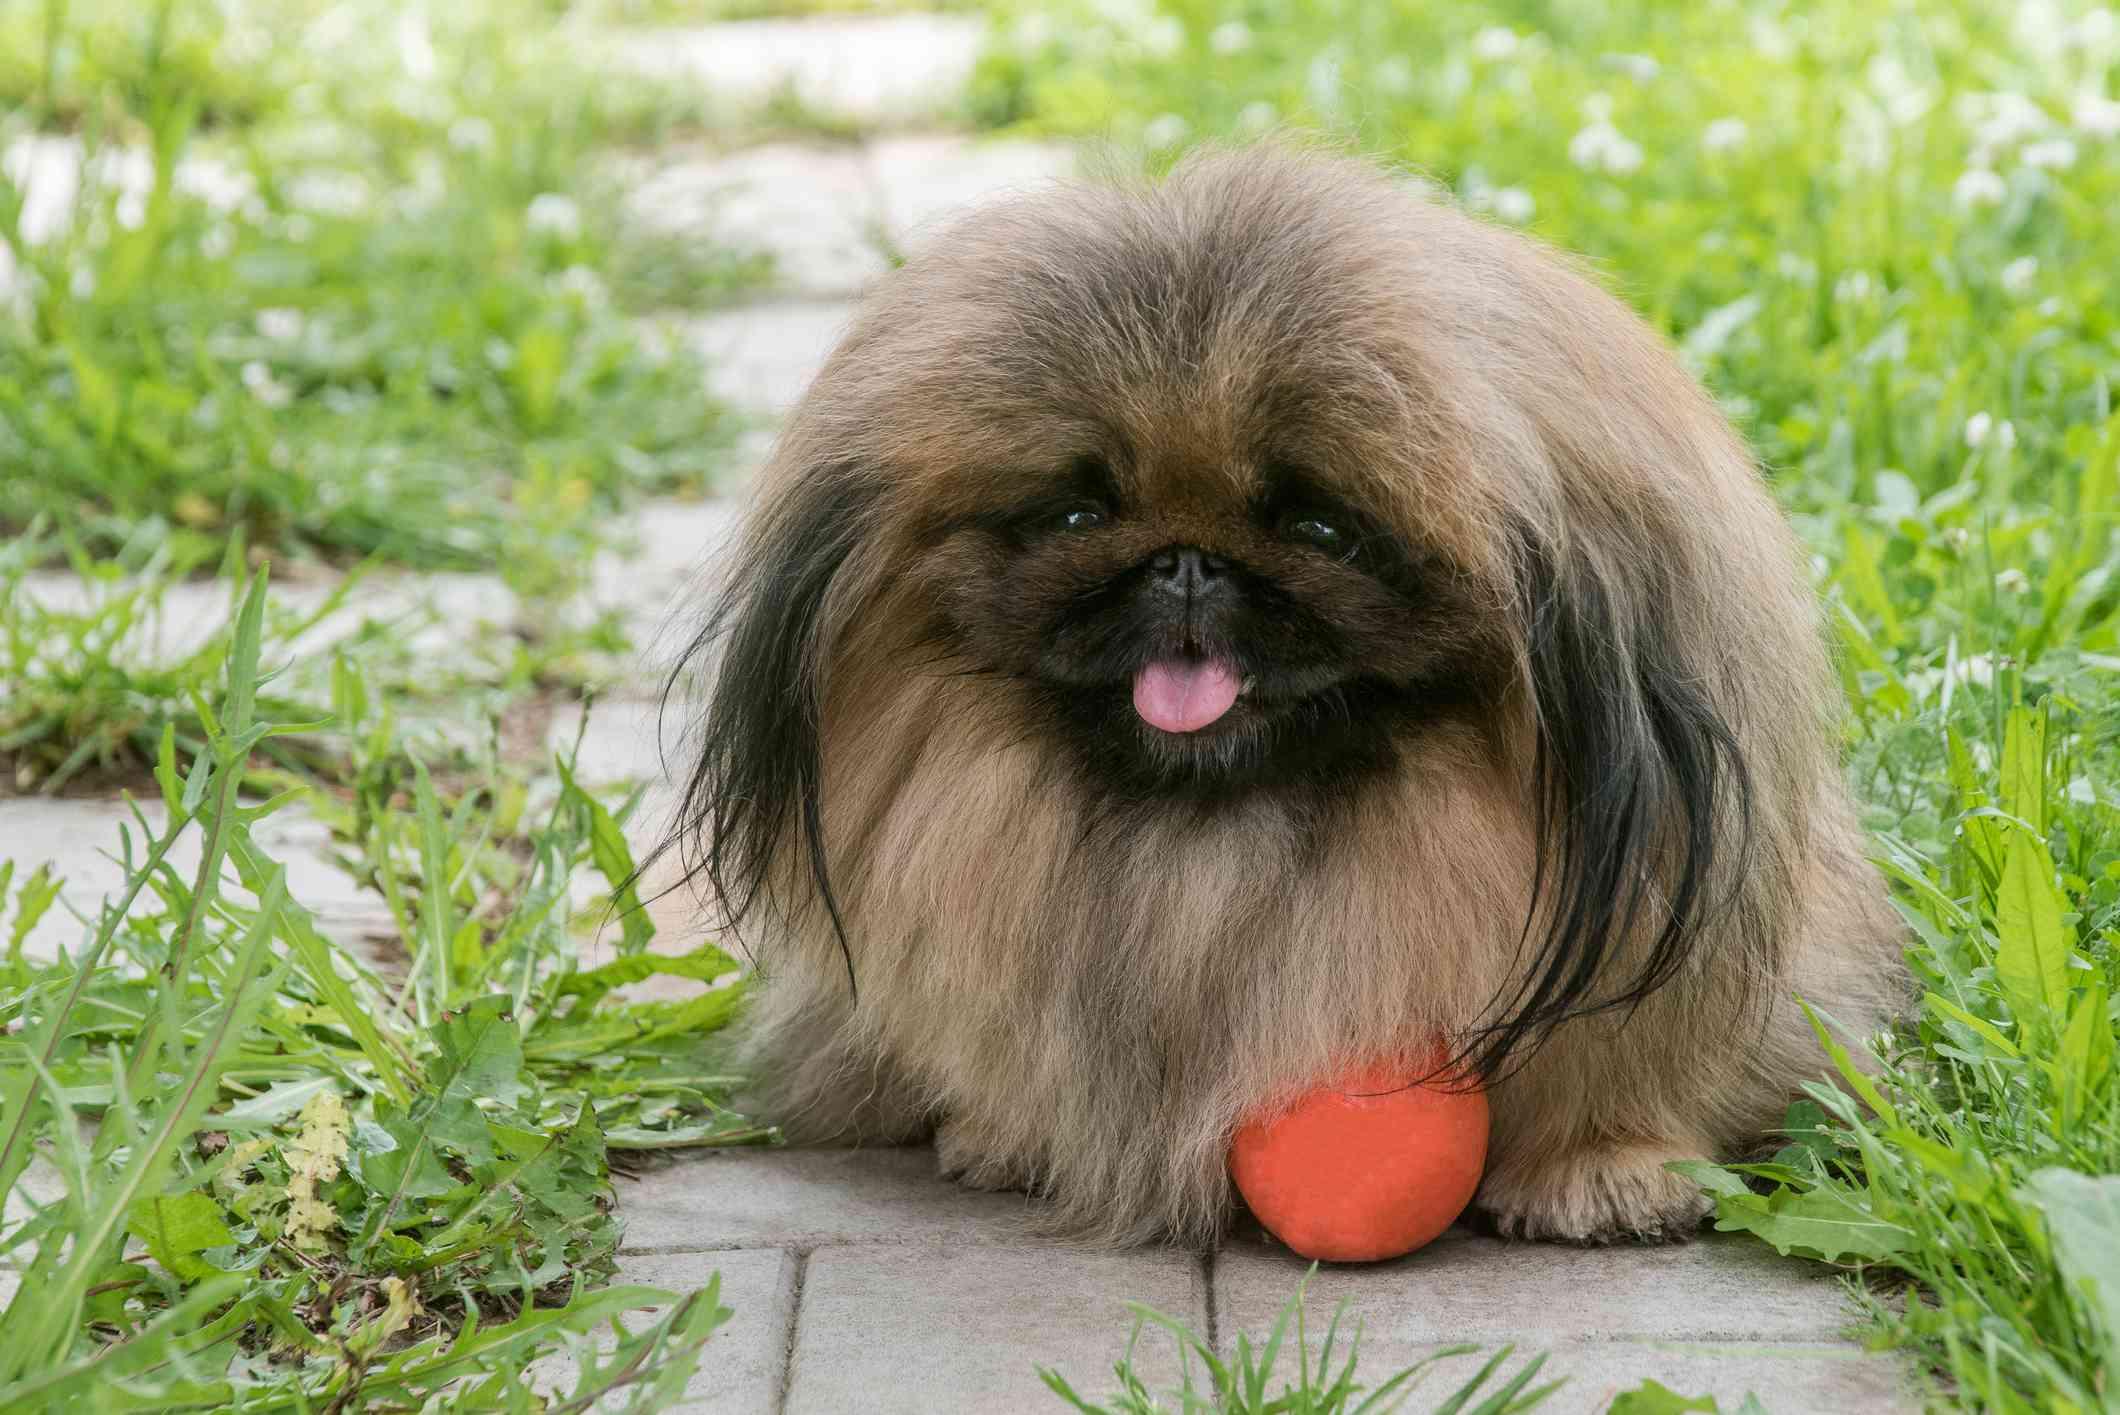 Pekingese outside with an orange ball